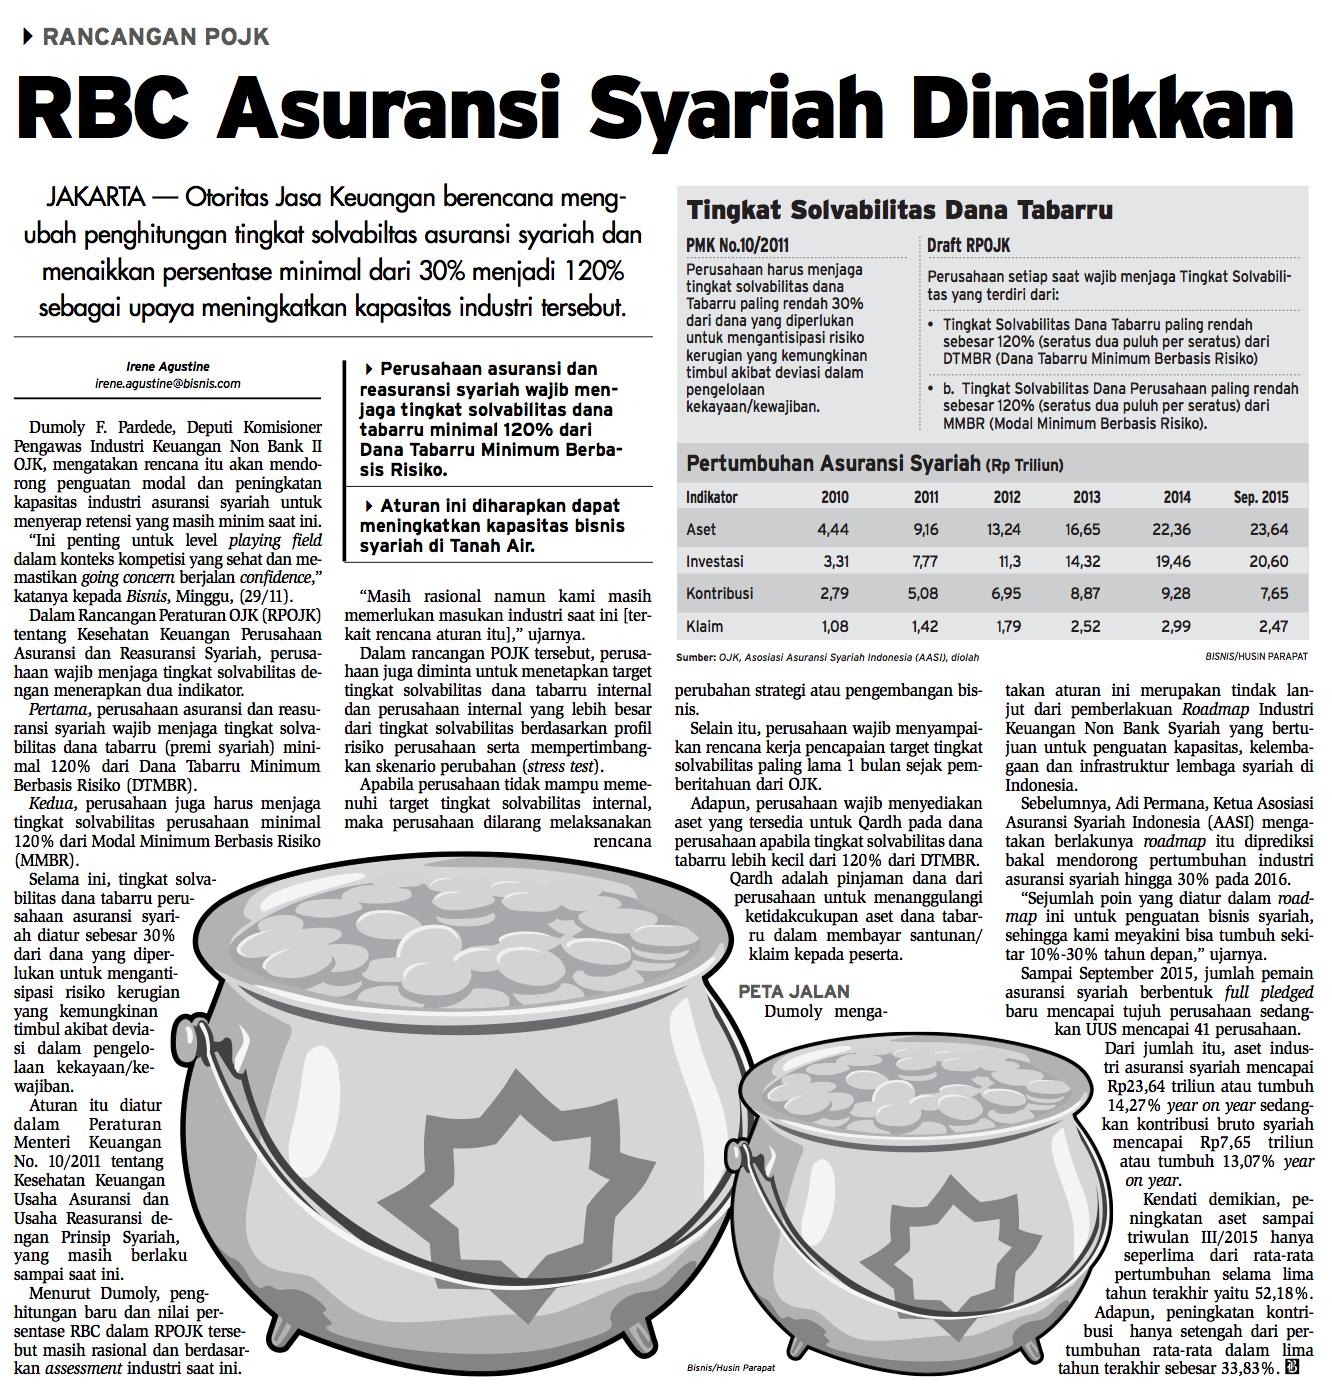 screen-shot-2015-11-30-at-7-02-53-am-bisnis-indonesia